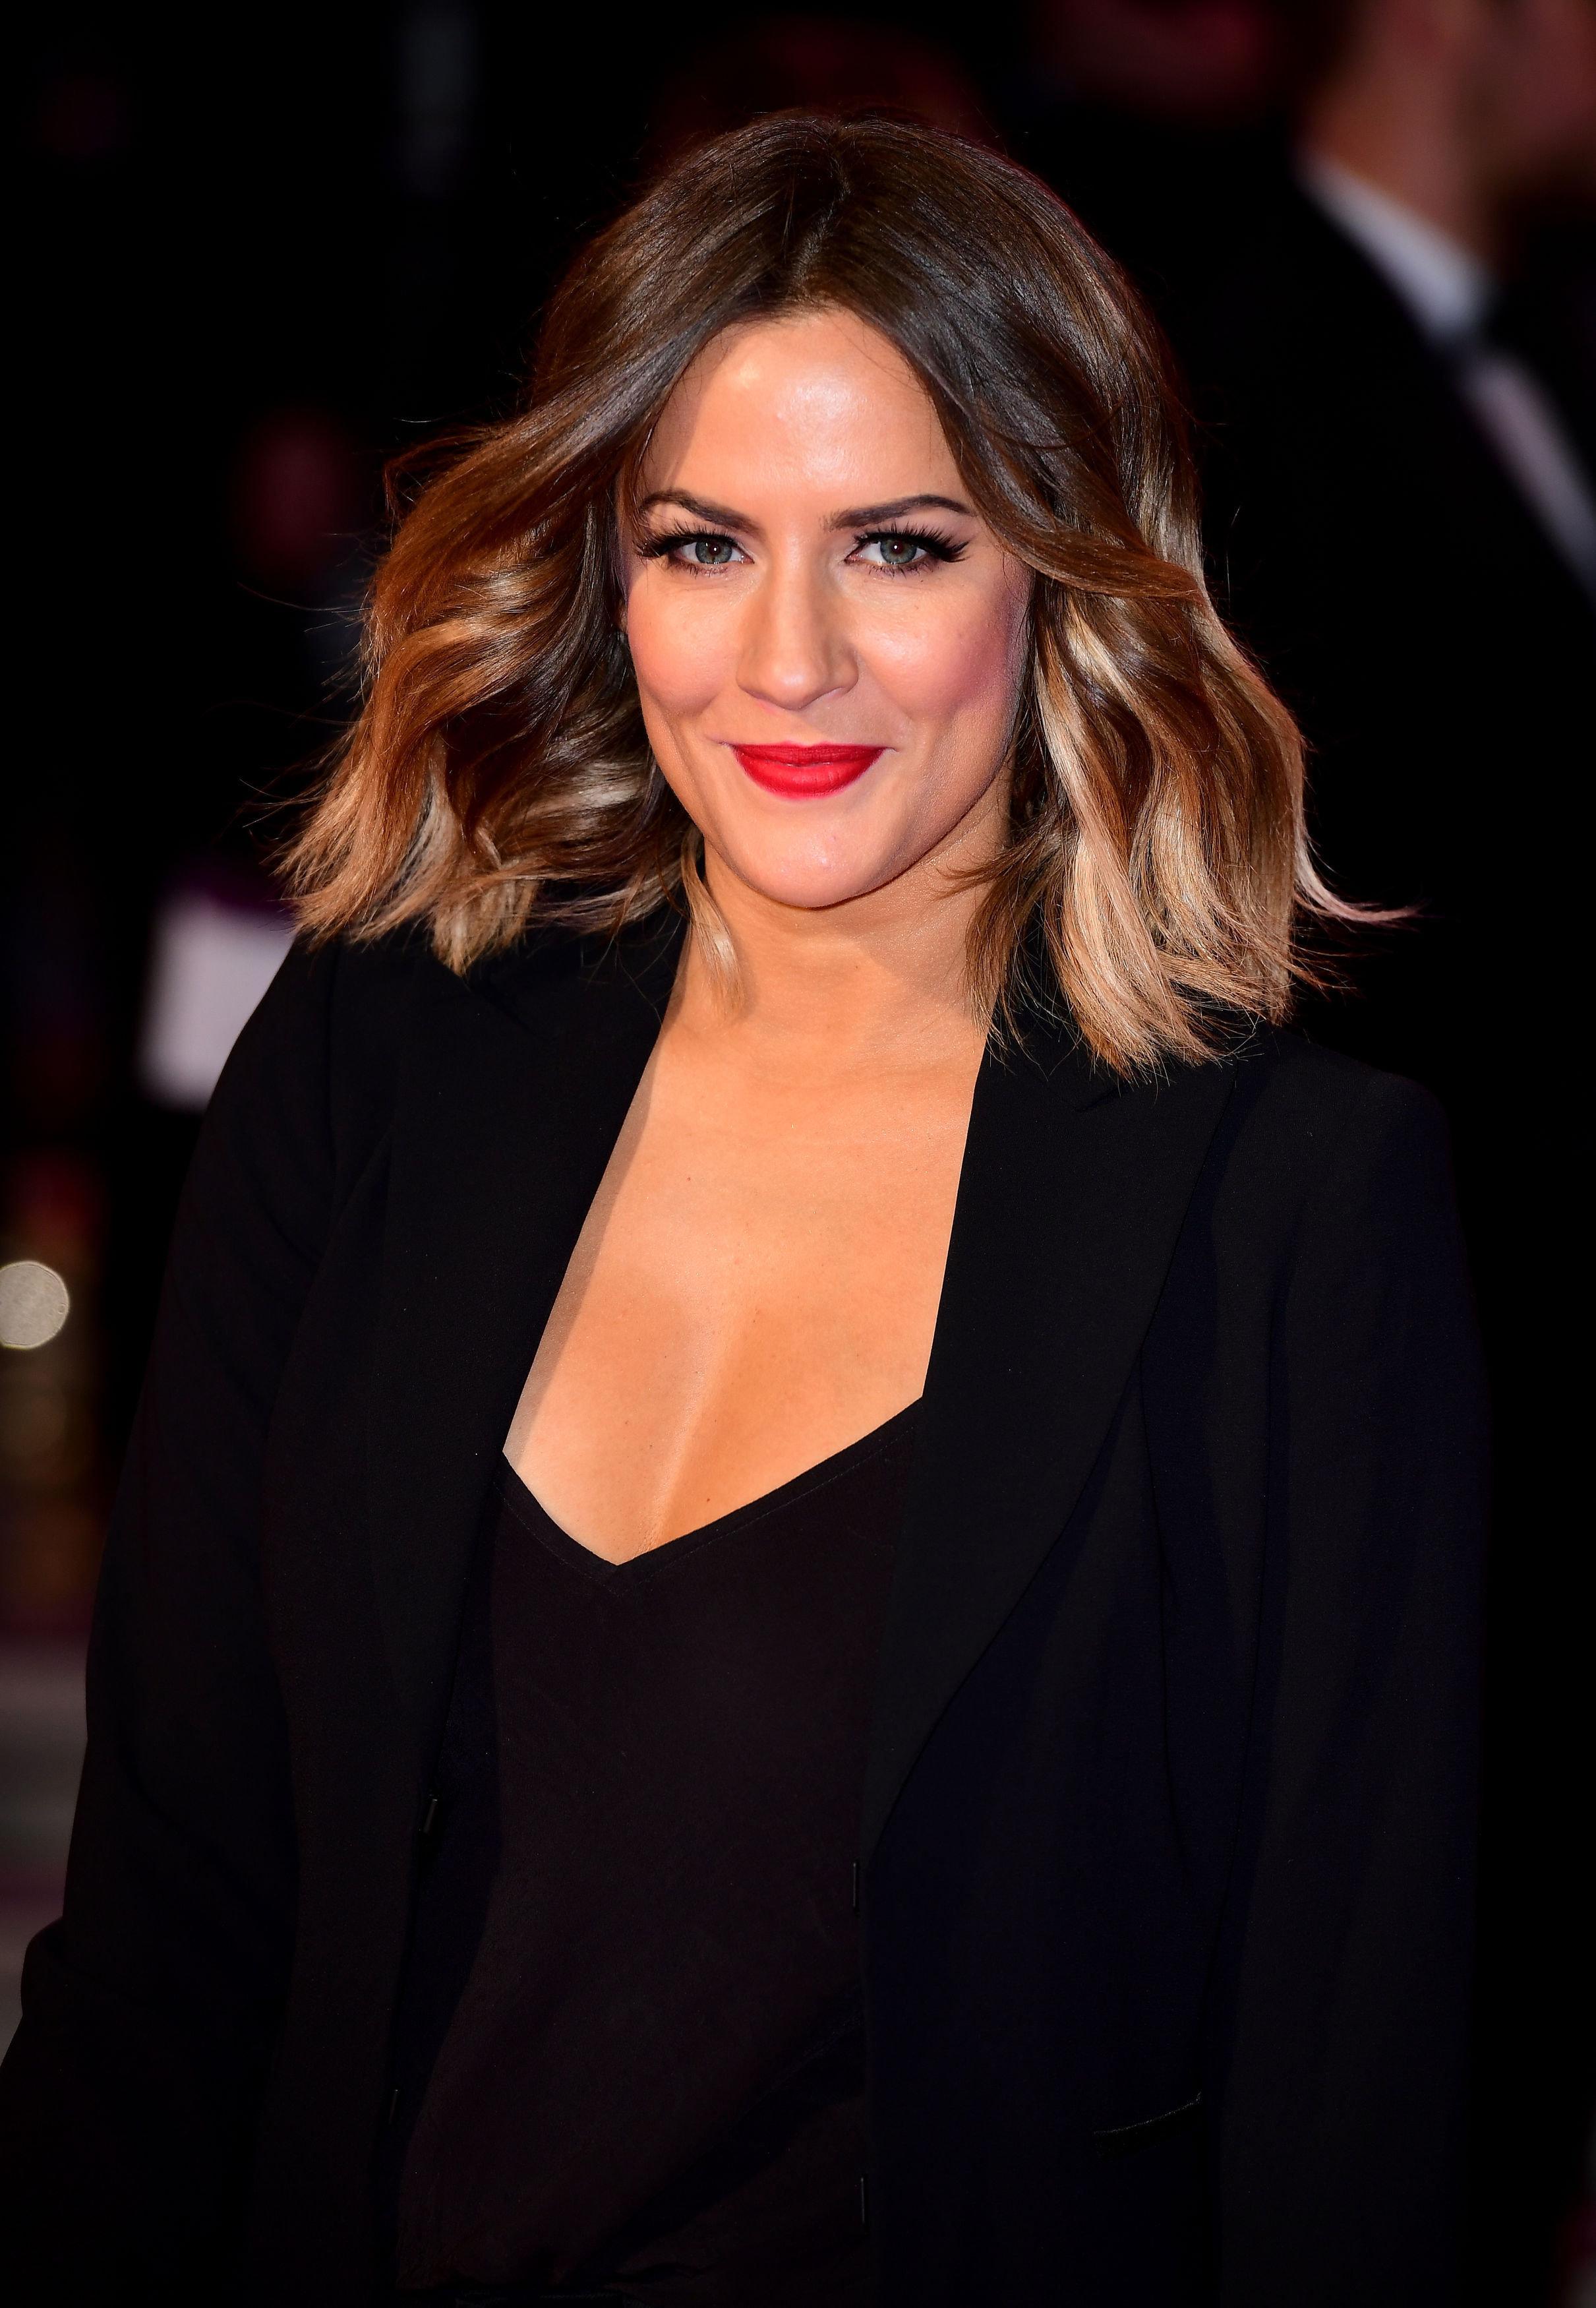 Caroline Flack Clears Up Those Pop Career